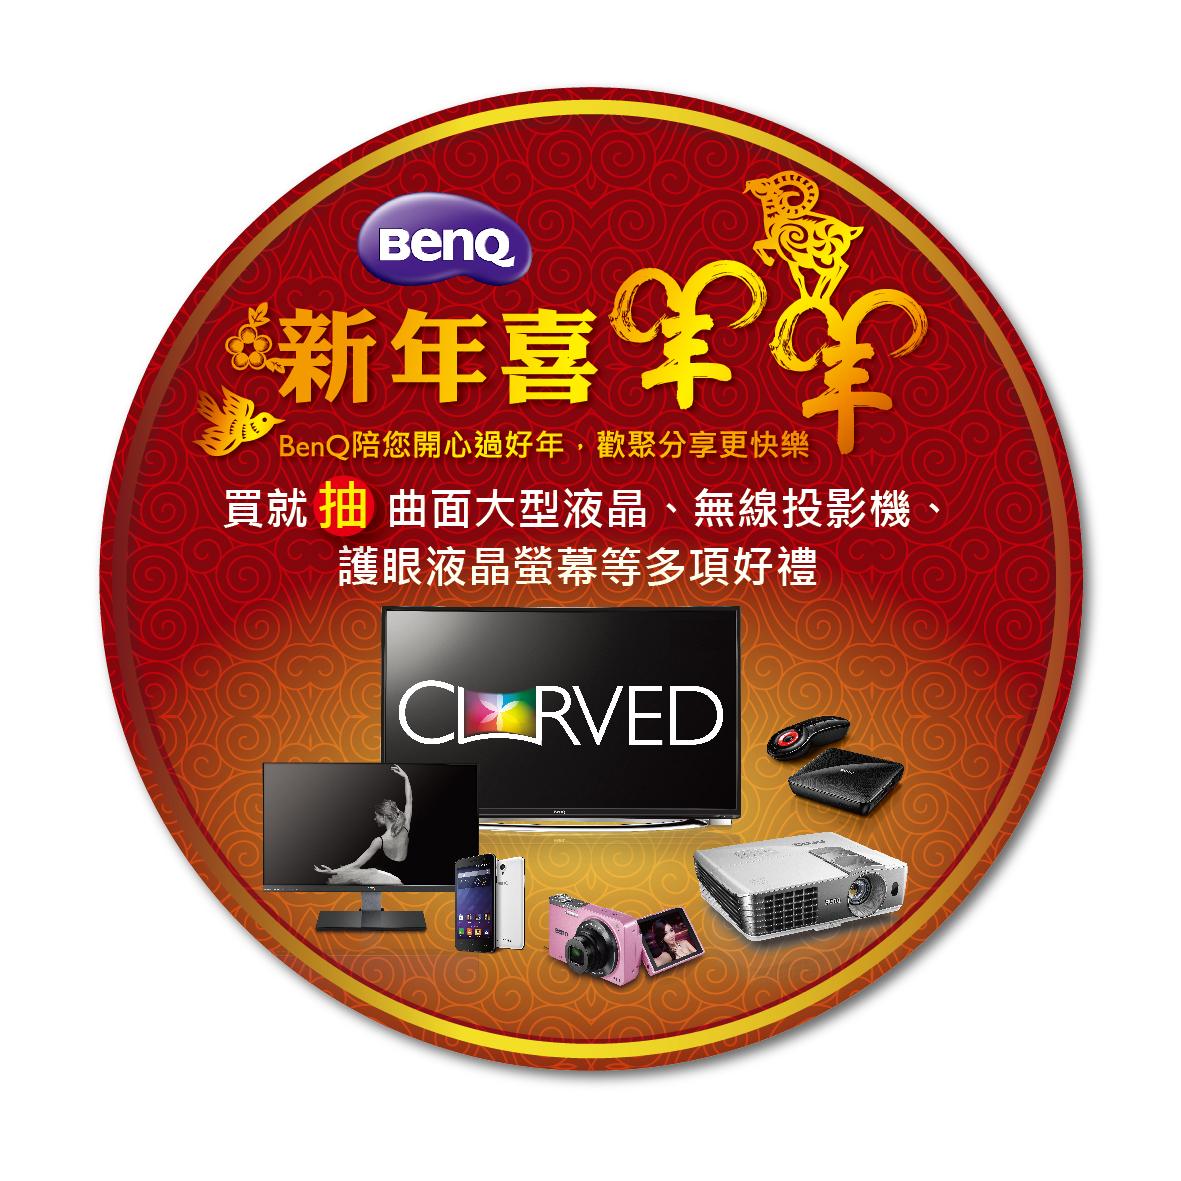 BenQ新年喜羊羊,歡聚樂分享!  買就抽曲面大型液晶、無線投影機、護眼液晶螢幕等多項好禮